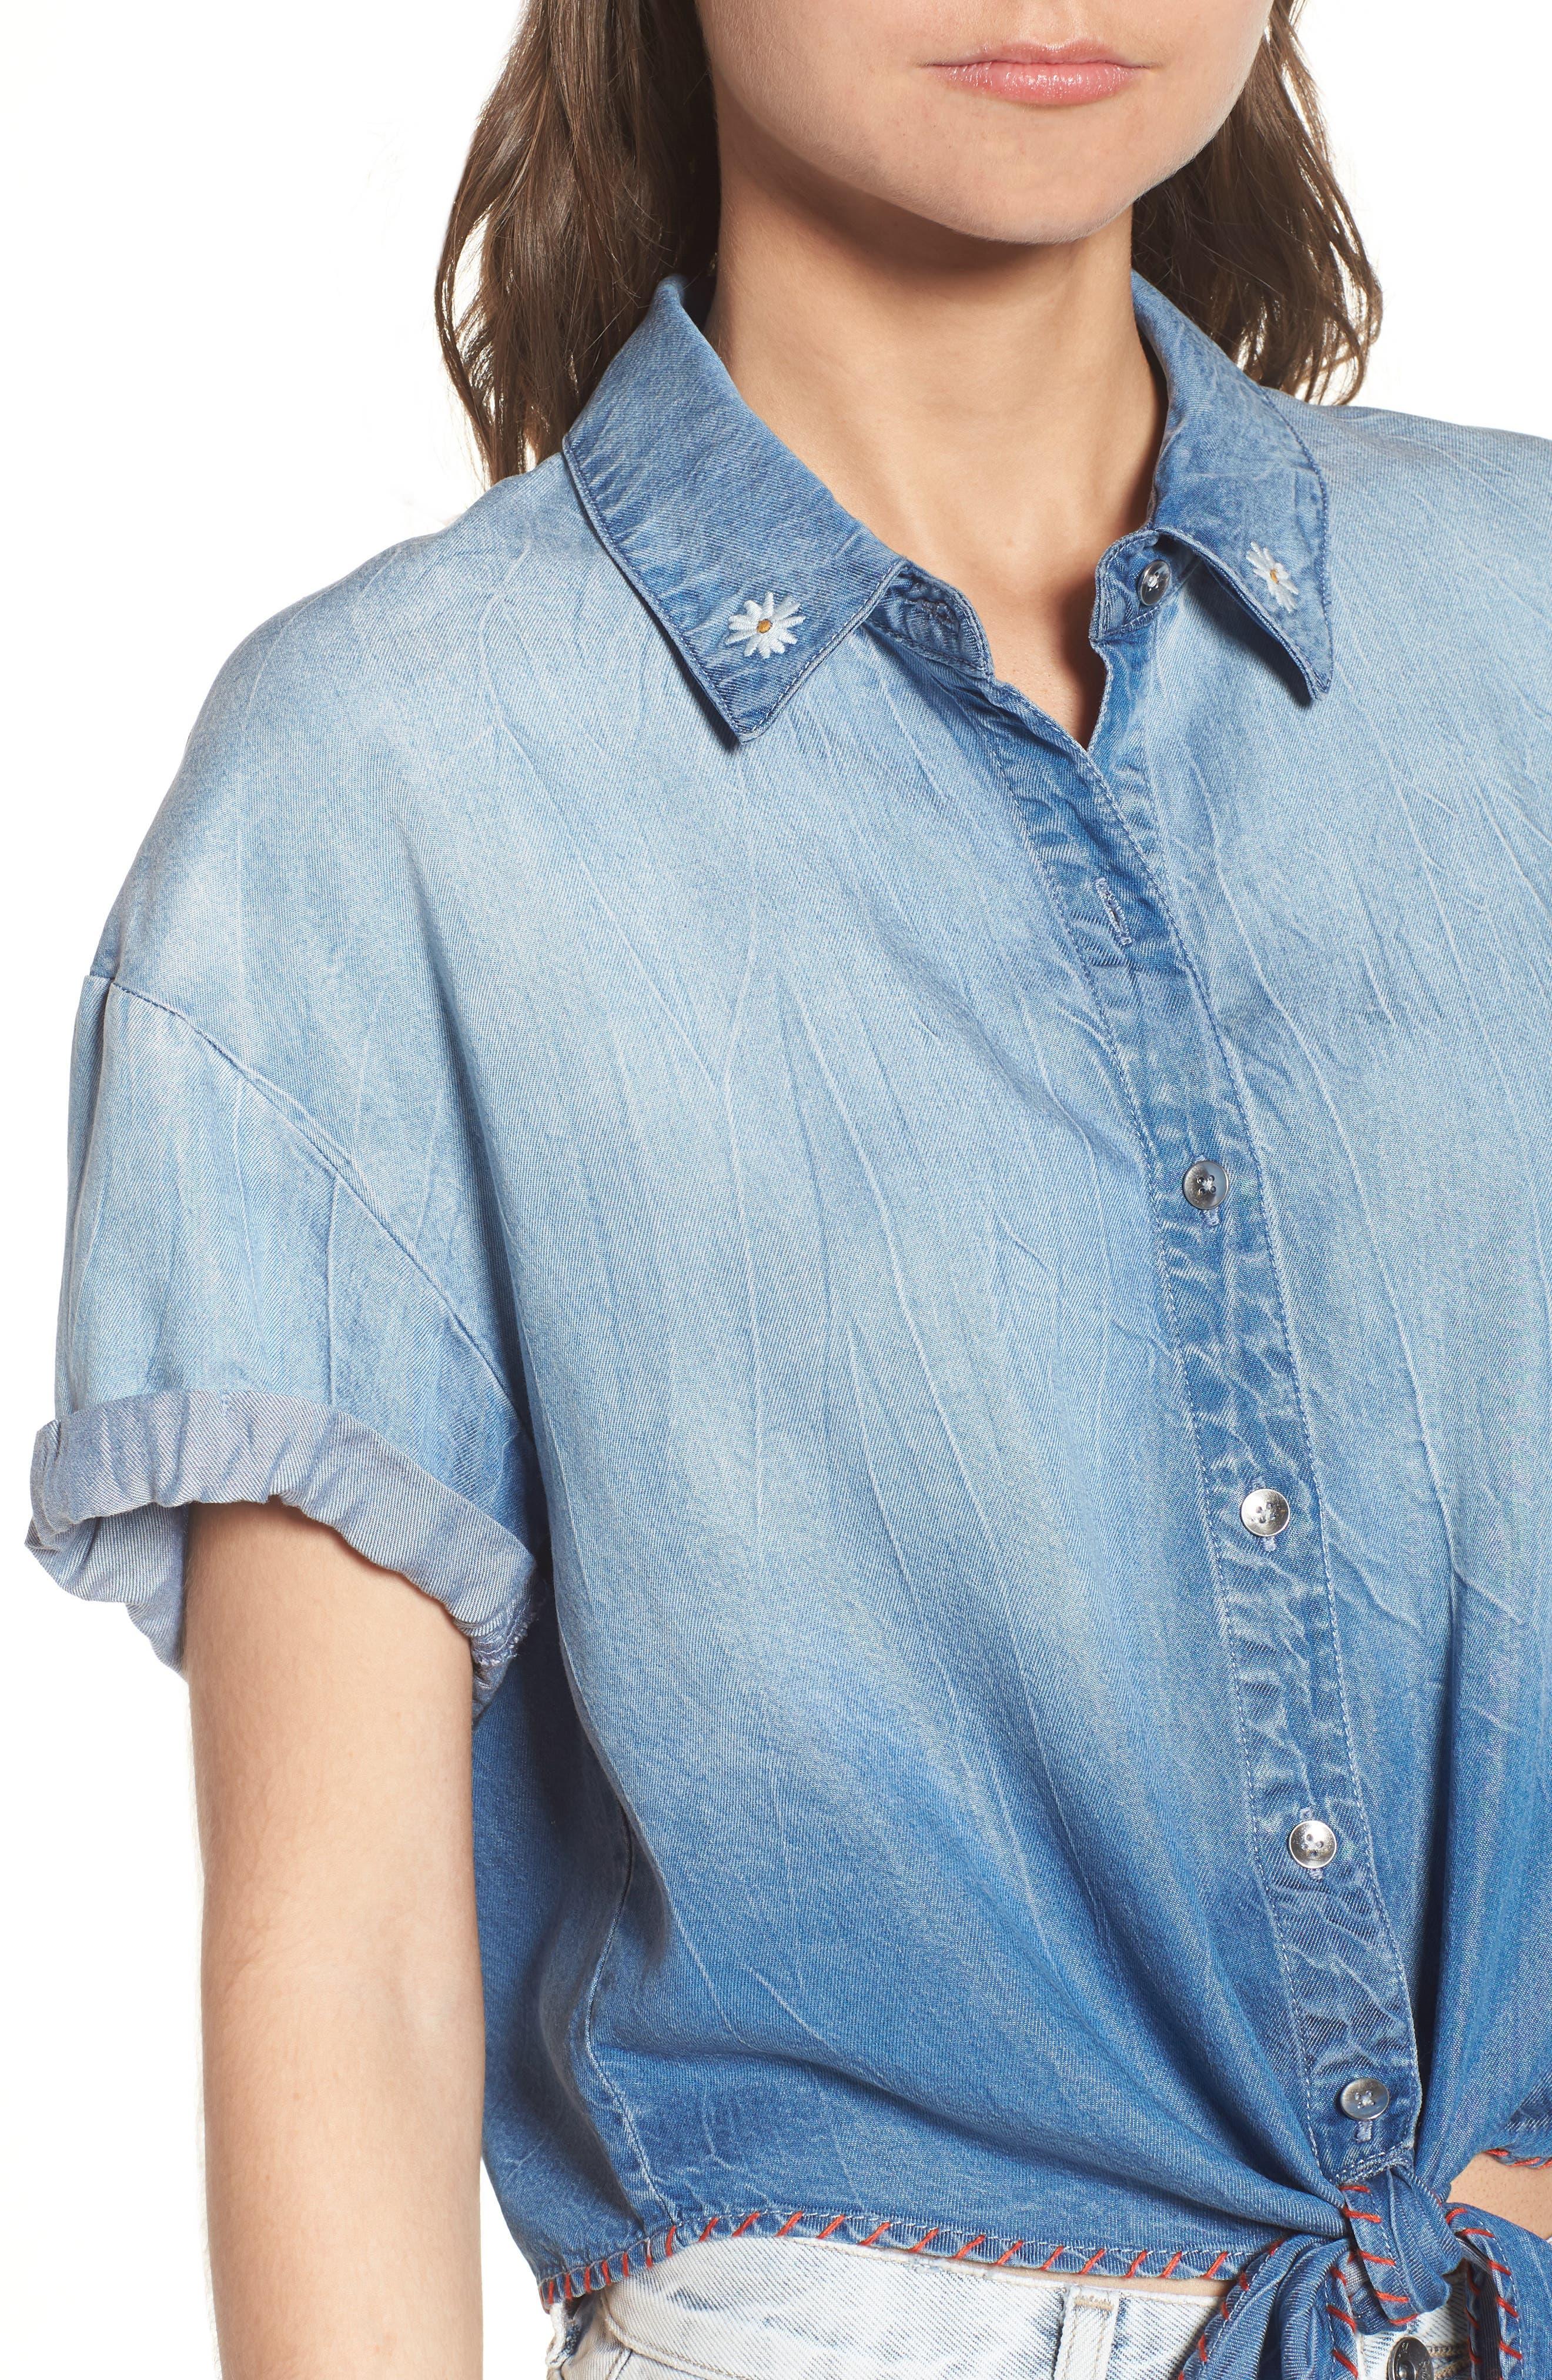 x Margherita Roma Indigo Shirt,                             Alternate thumbnail 4, color,                             467